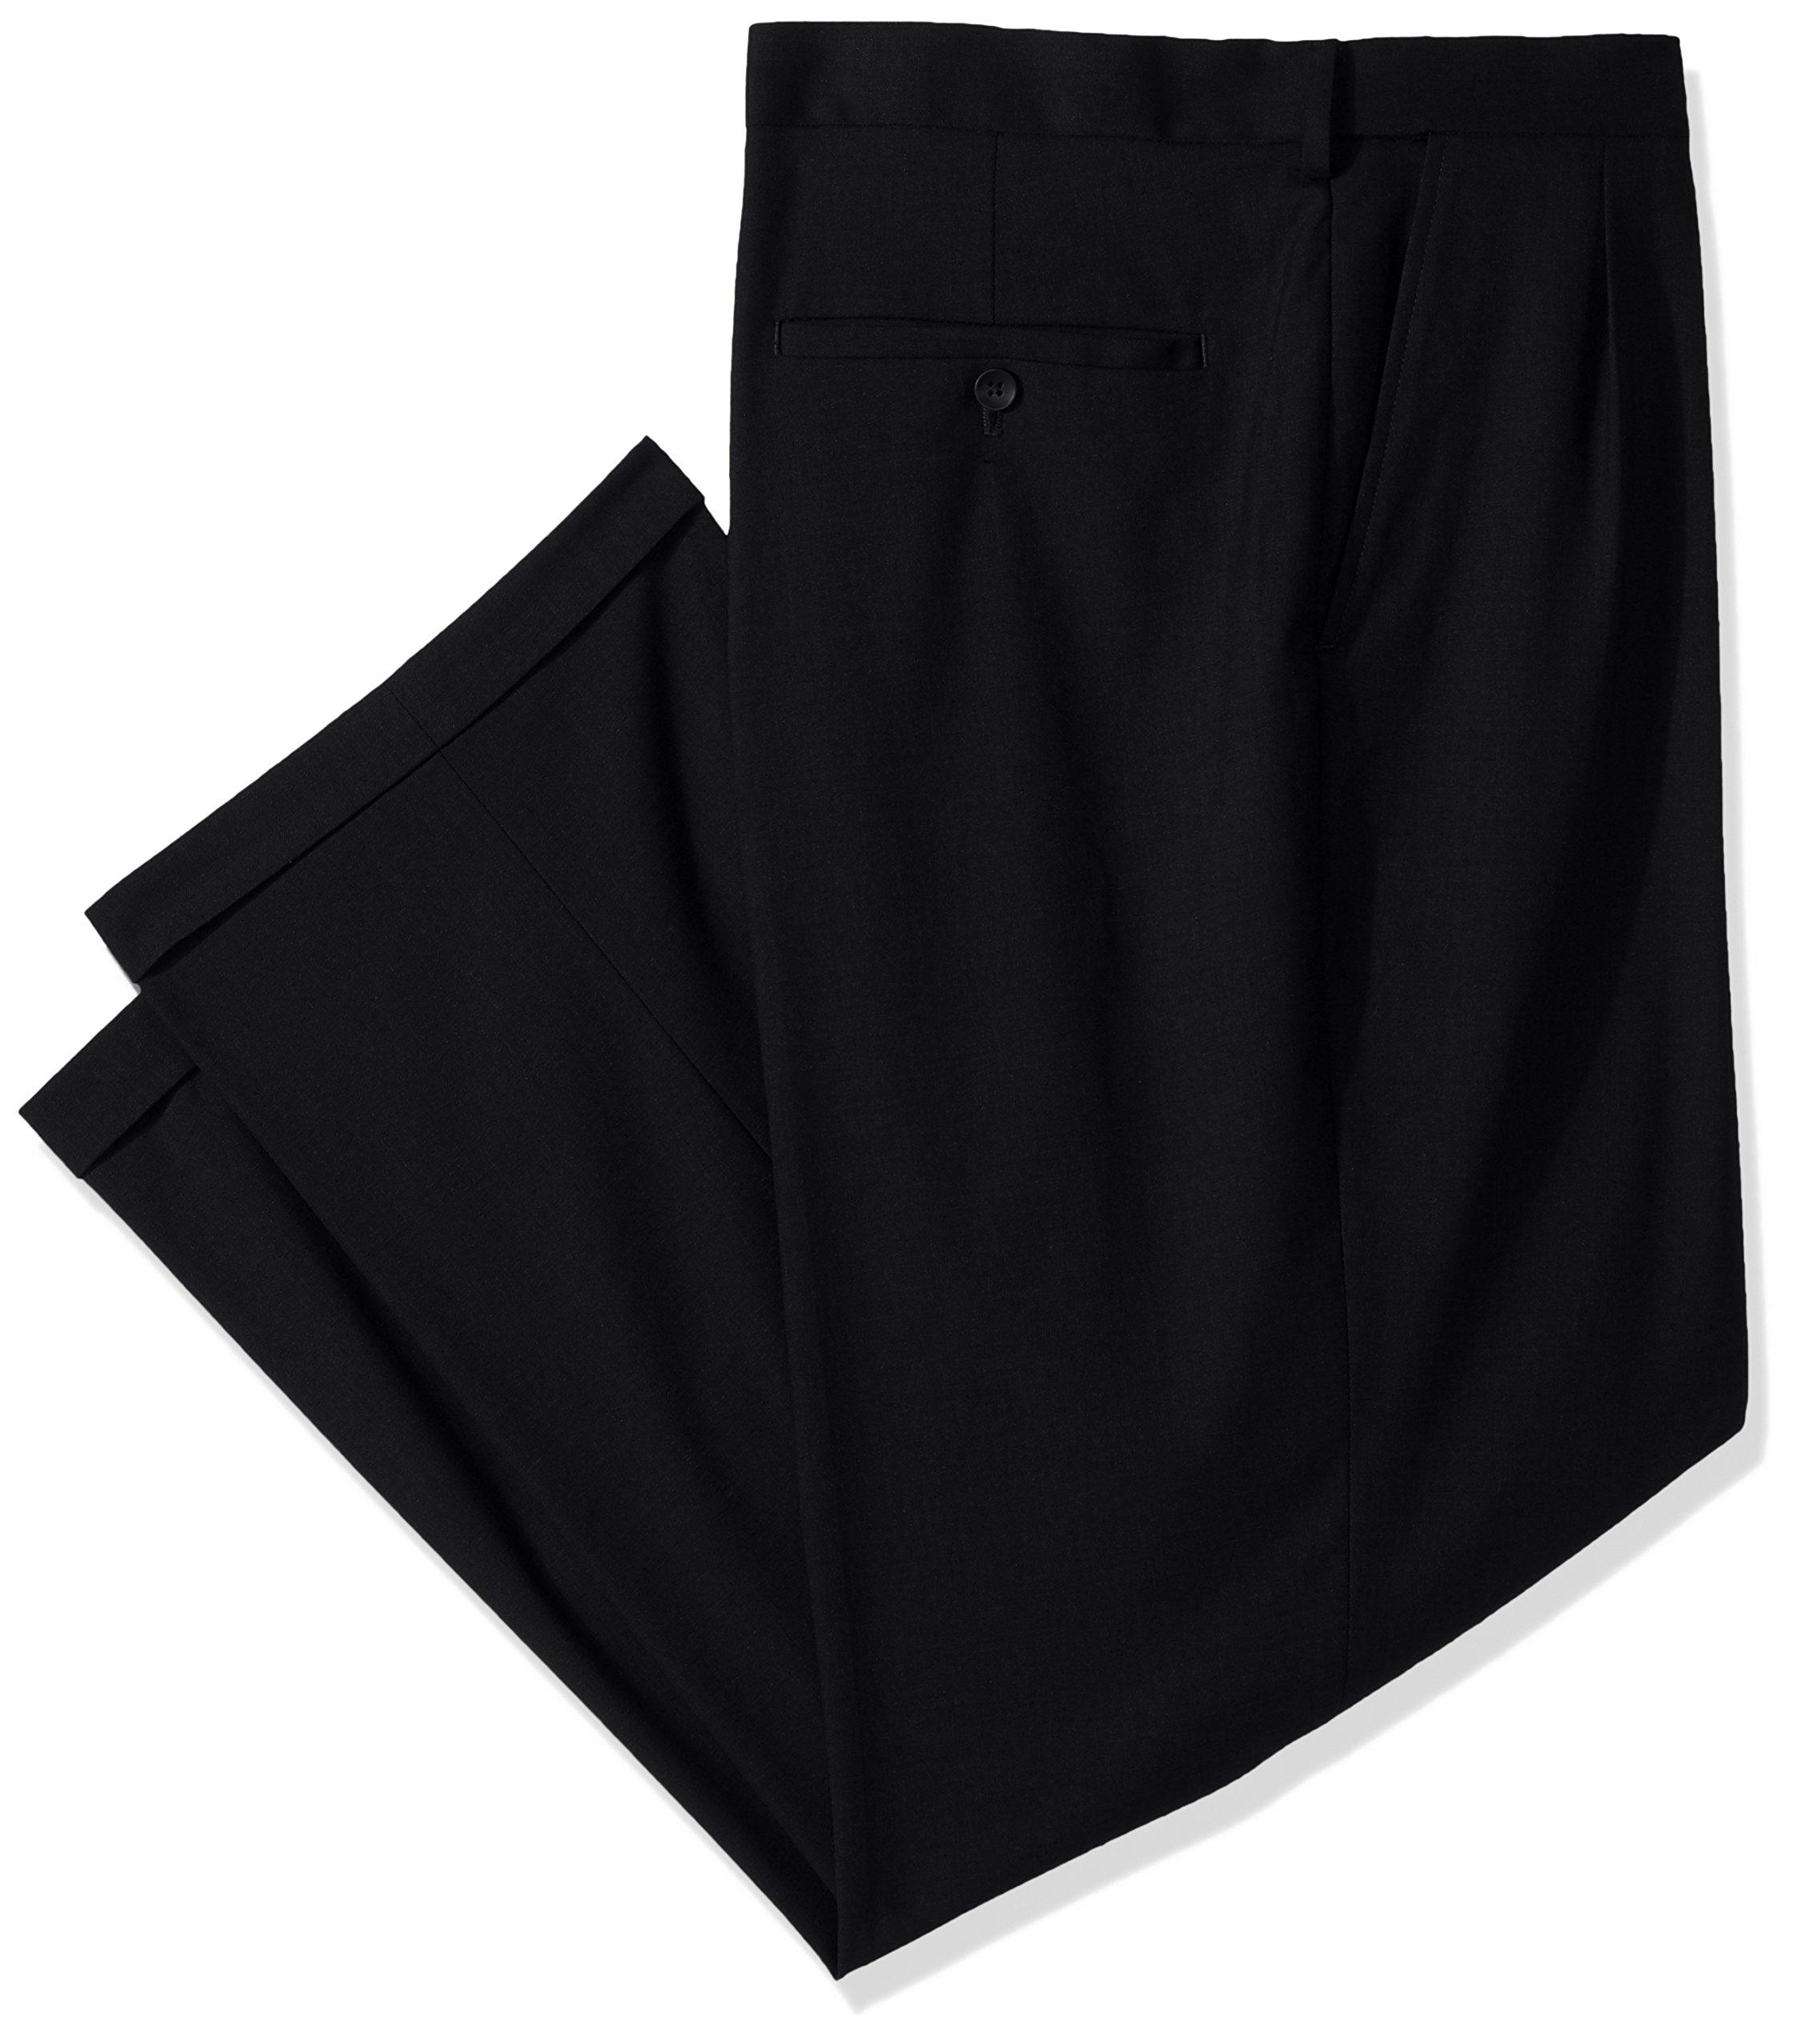 Haggar Men's Big and Tall J.m Premium Stretch Classic Fit Pleat Front Pant, Black, 44Wx30L